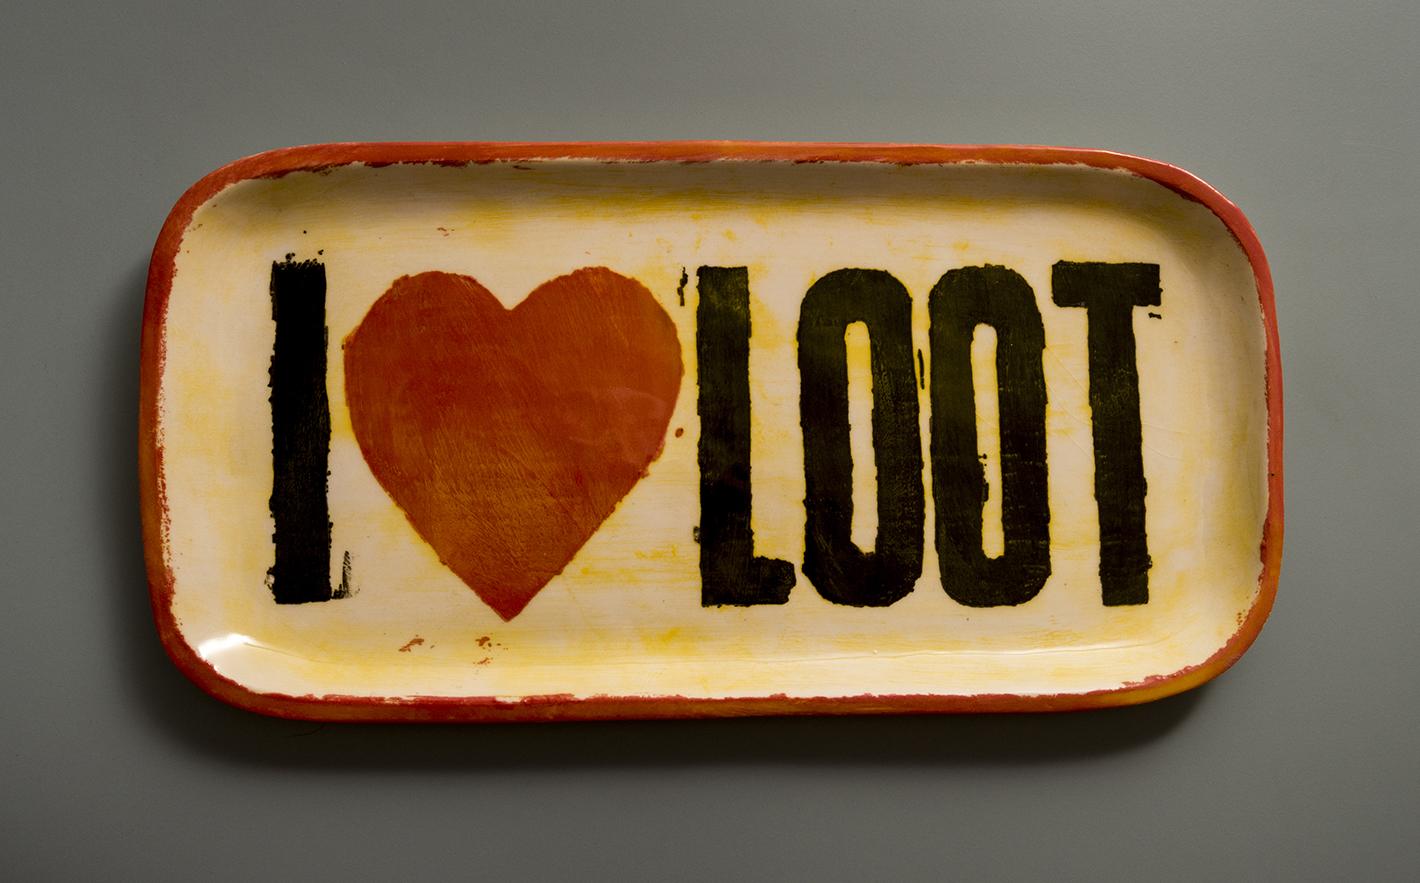 I LOVE LOOT W.jpg